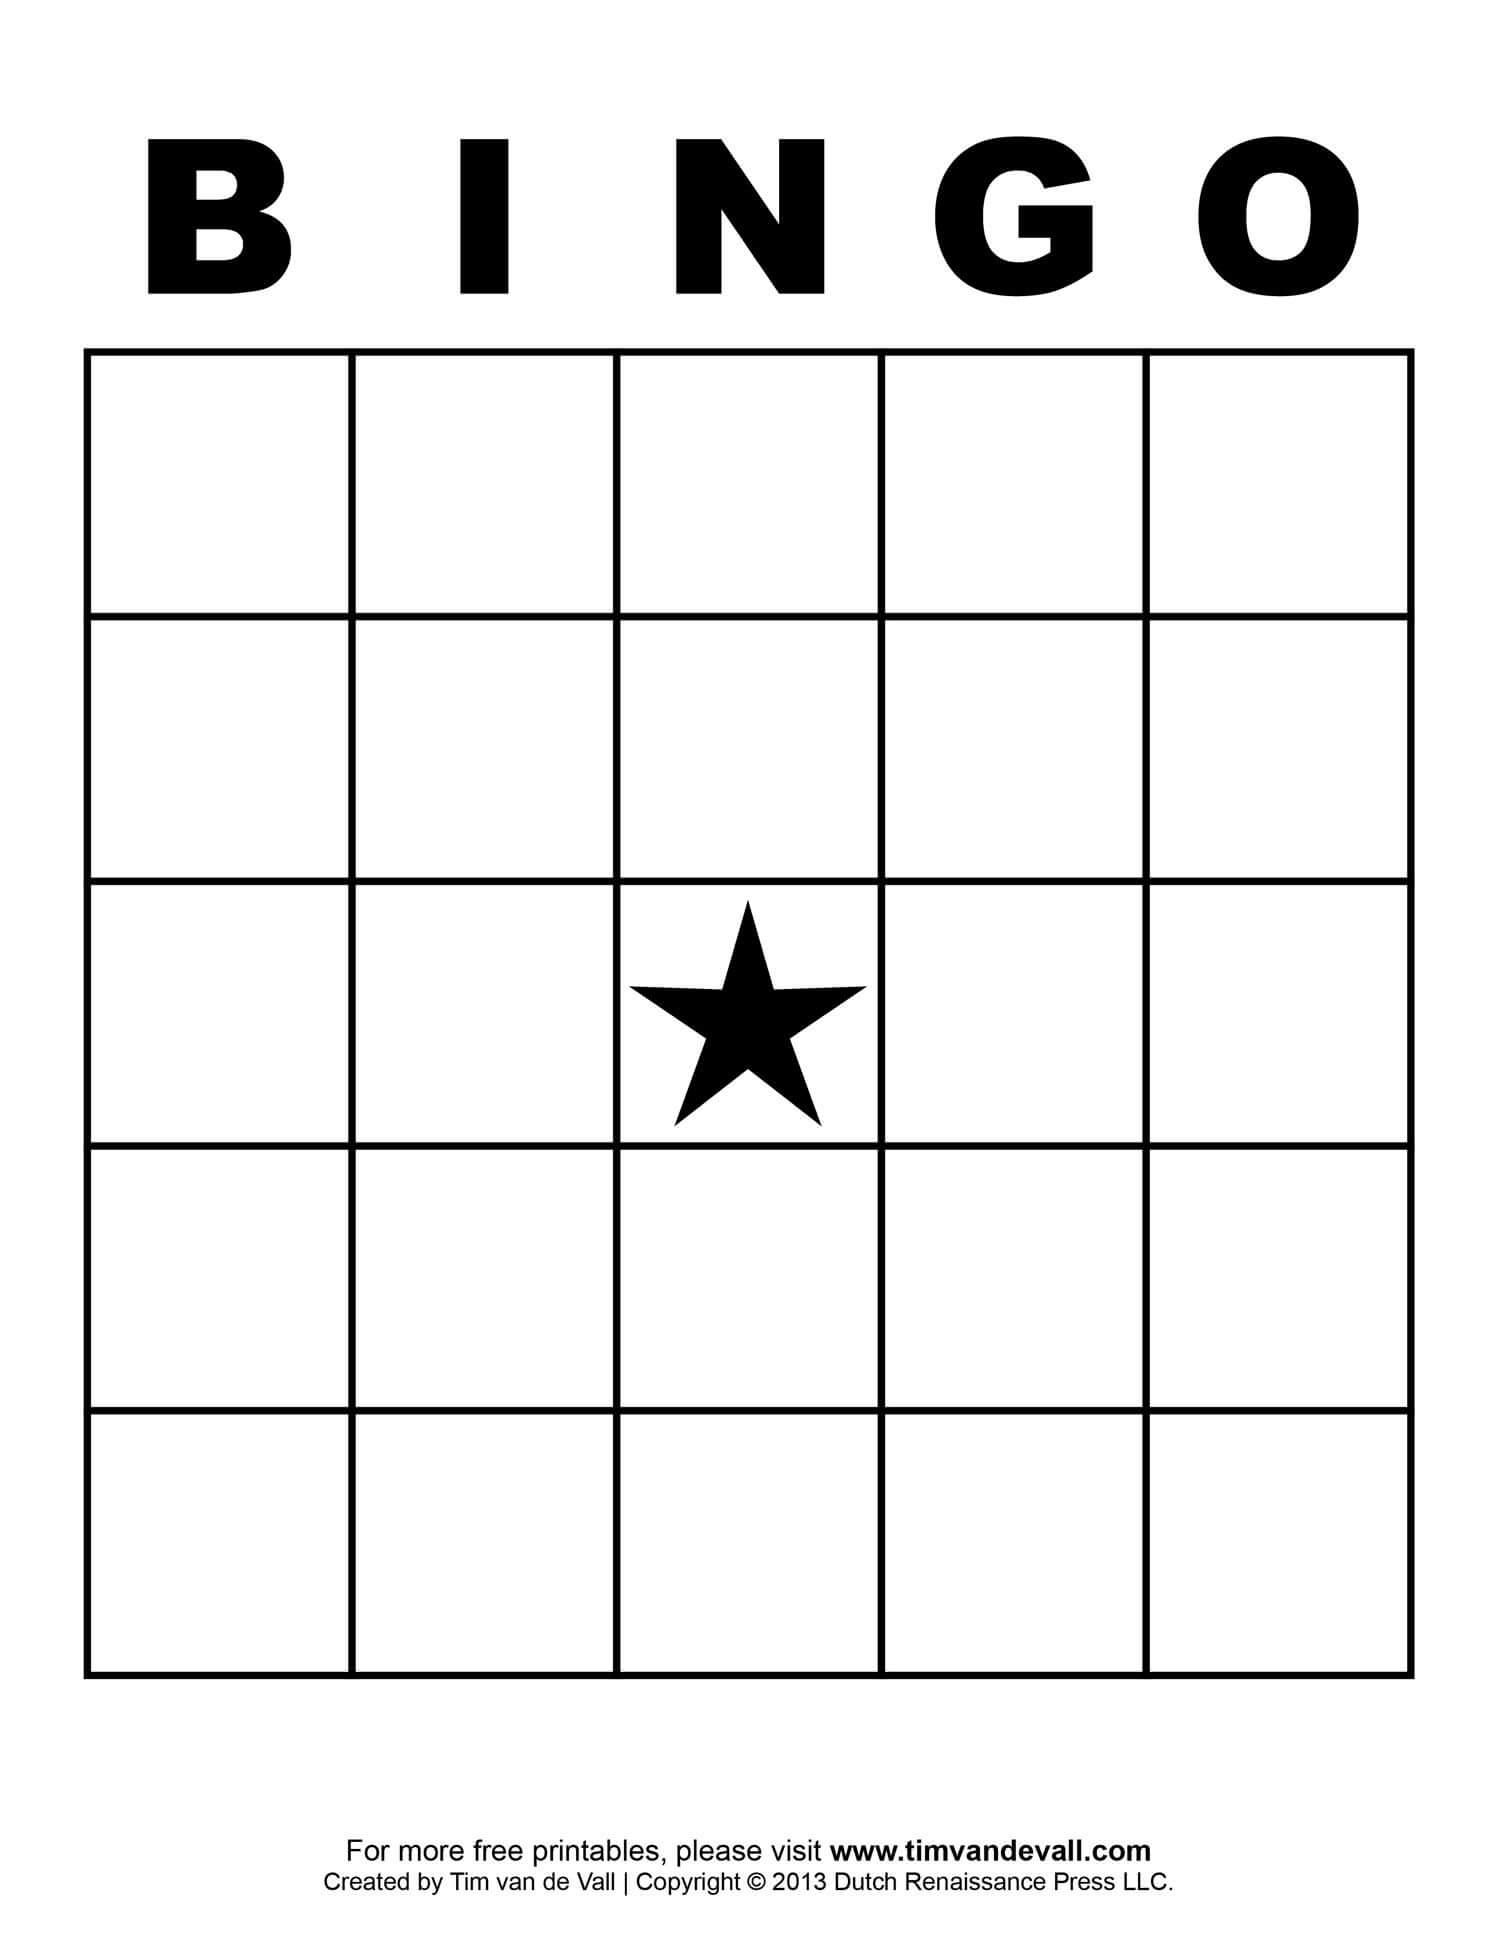 Free Printable Blank Bingo Cards Template 4 X 4 | Bingo Card Intended For Blank Bingo Template Pdf